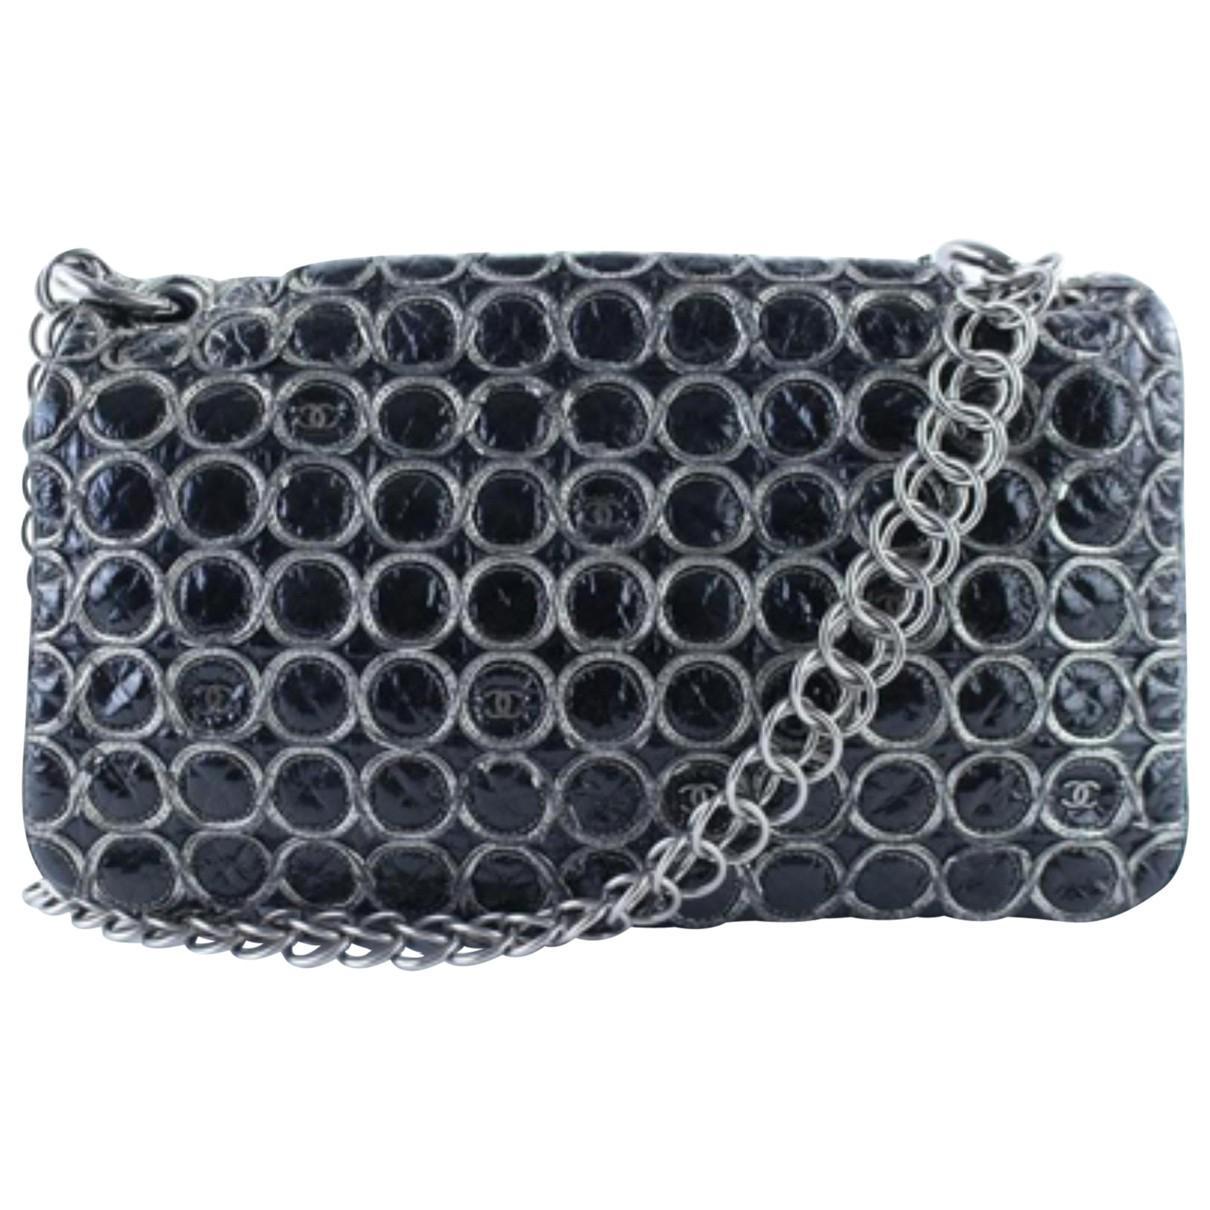 Pre-owned - Camera patent leather handbag Chanel KDOMDi2ab